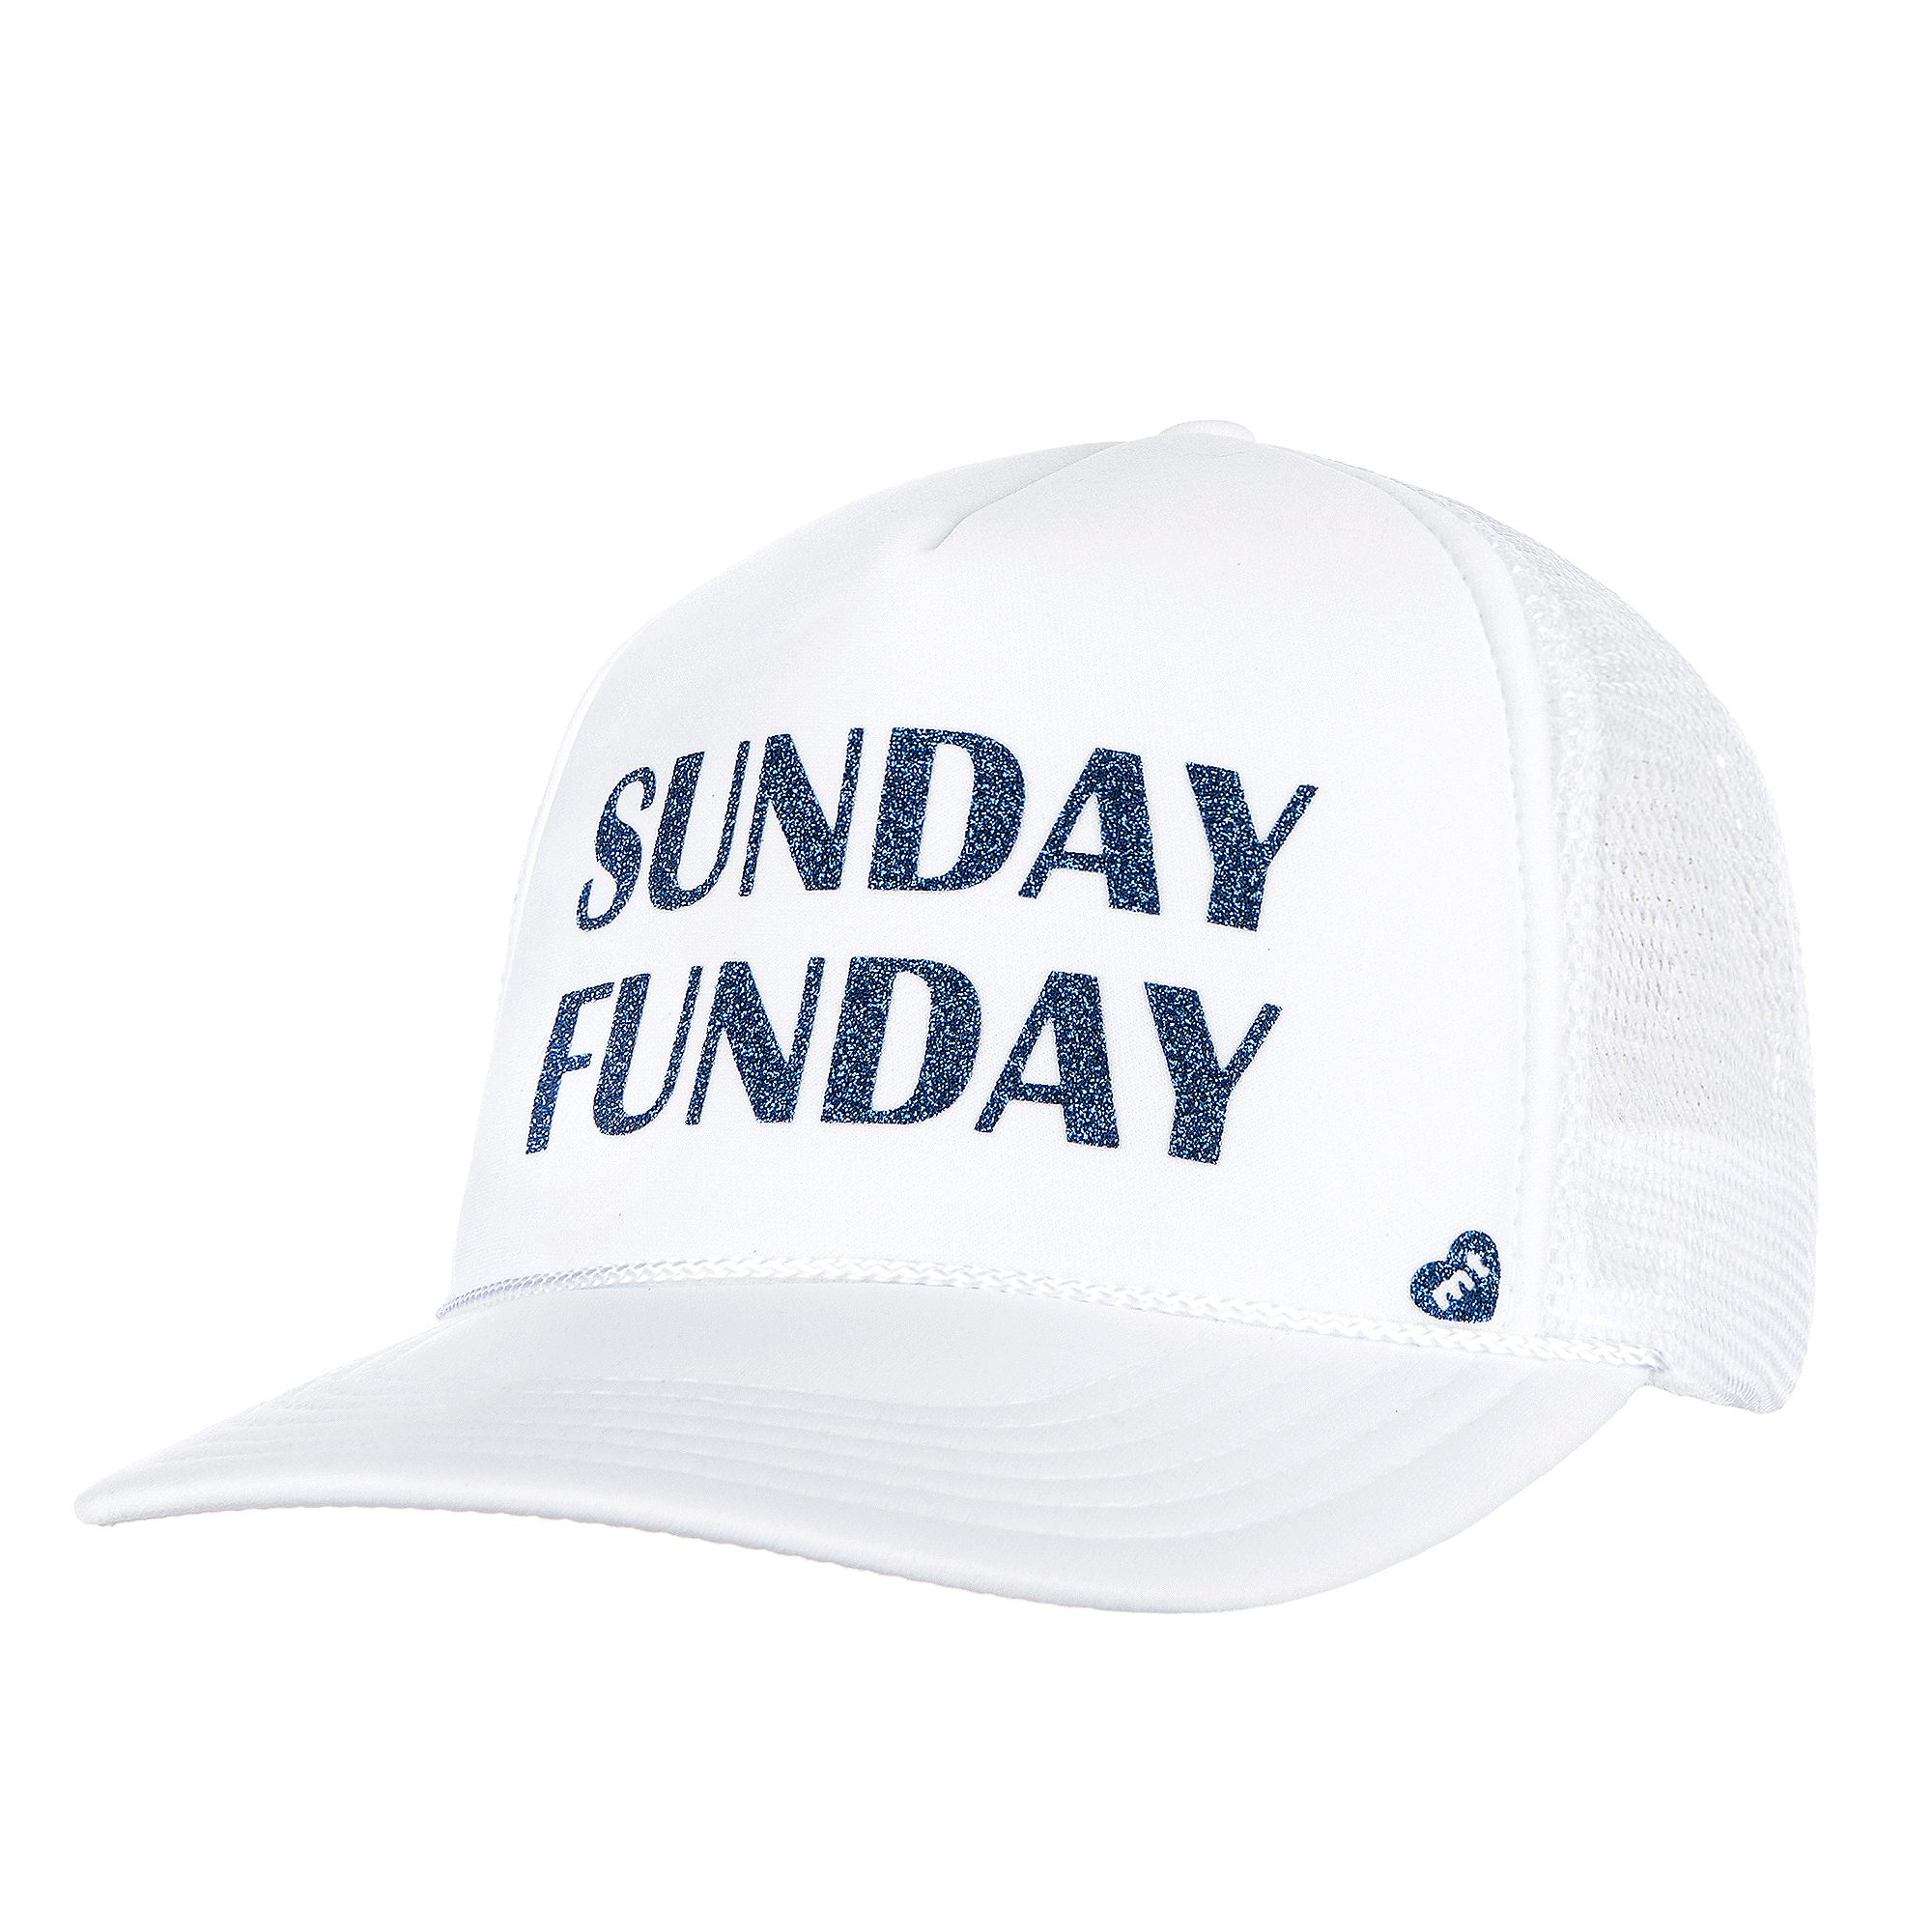 Studio Mother Trucker & Co Sunday Funday Trucker Hat